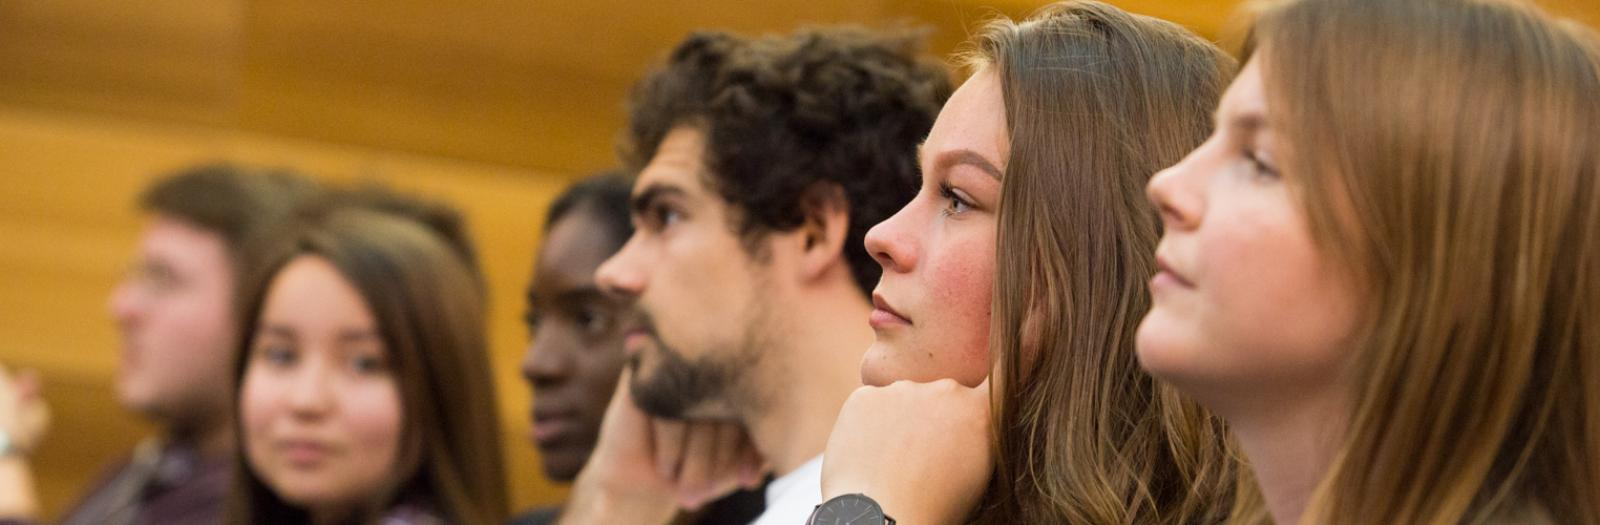 Students attending a seminar